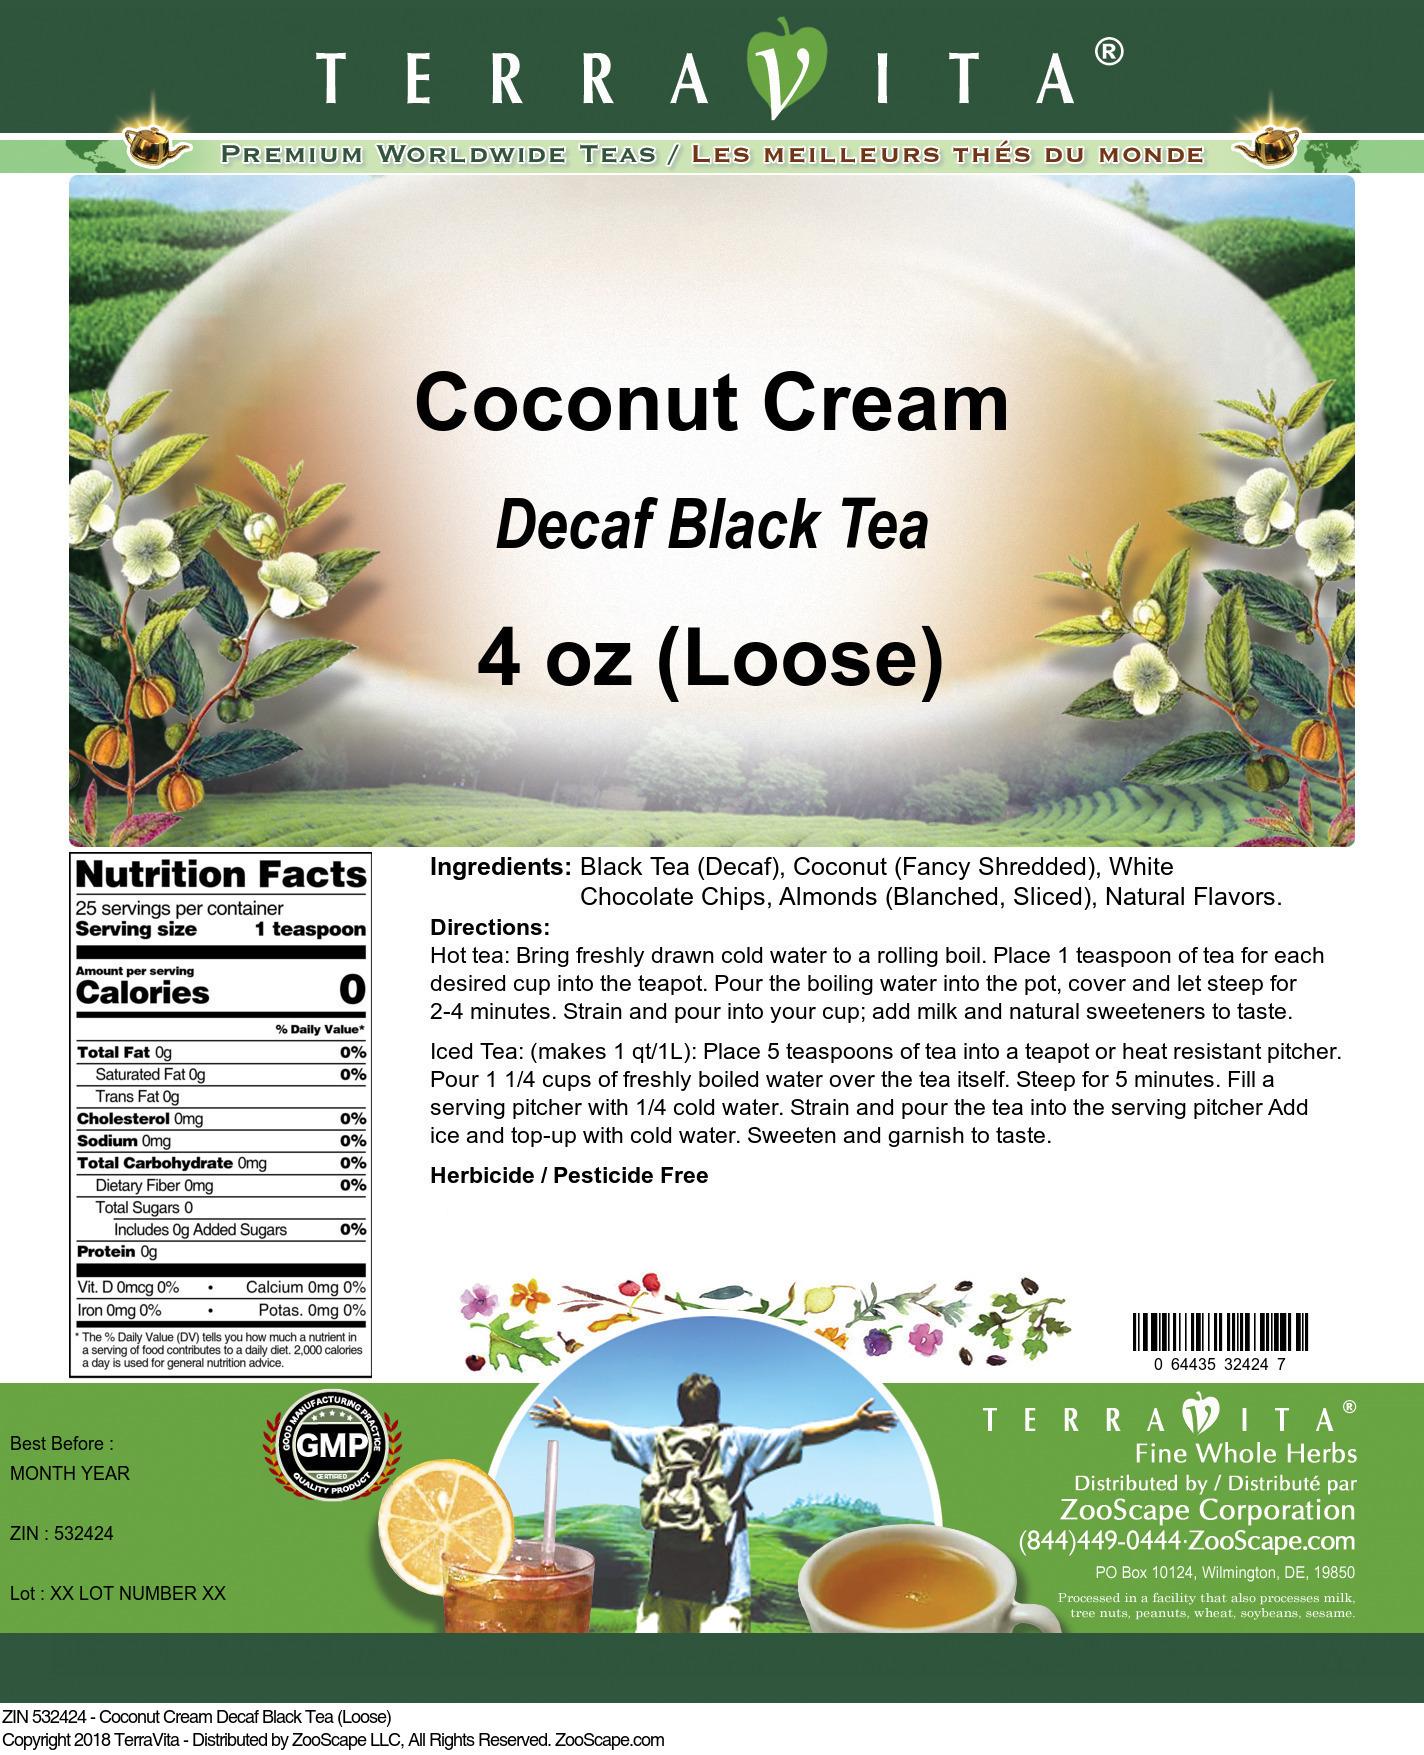 Coconut Cream Decaf Black Tea (Loose)